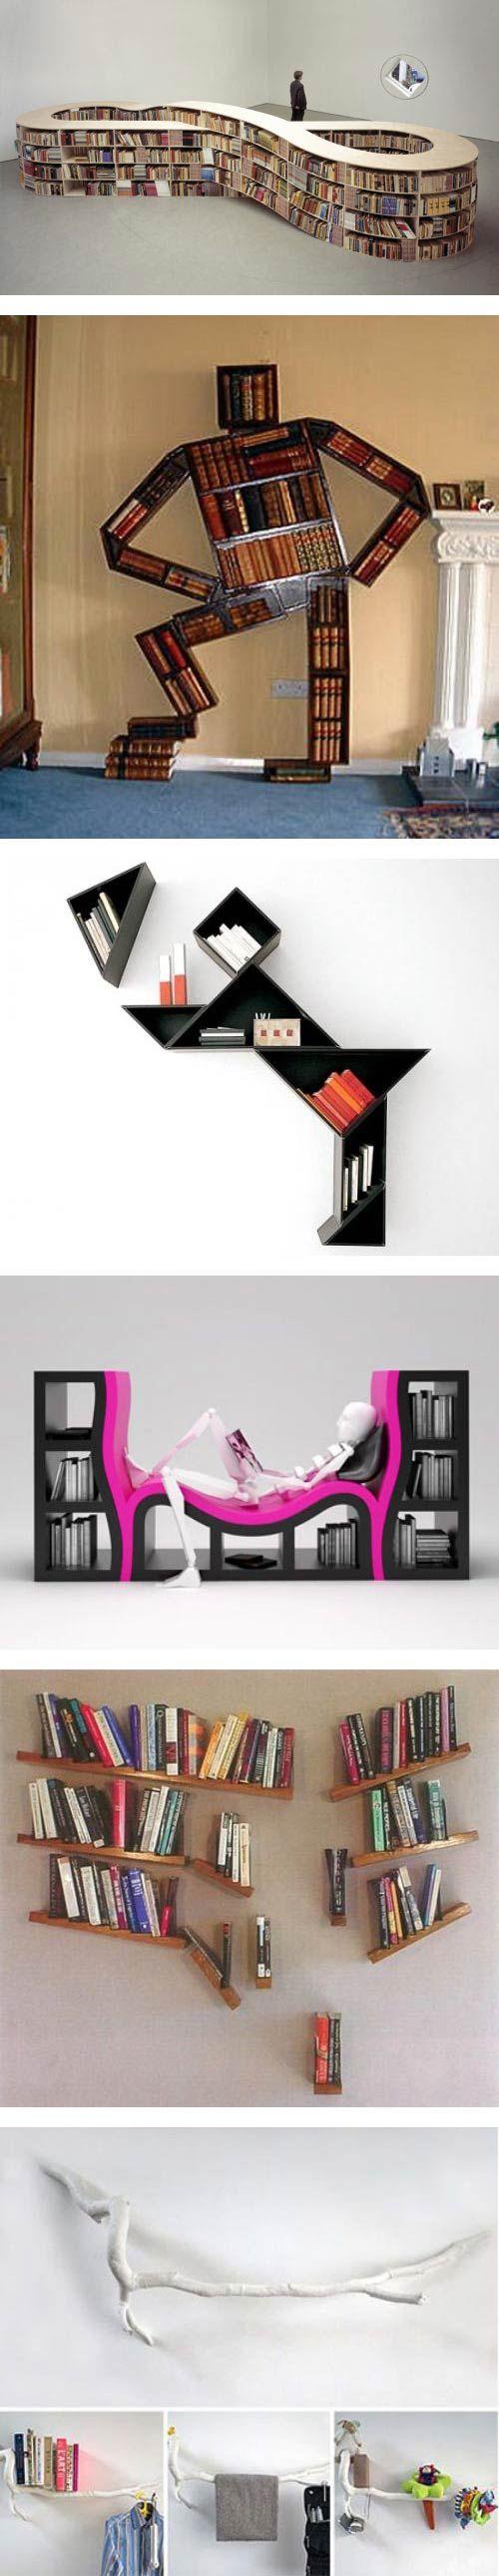 Creative and Unusual Bookshelves